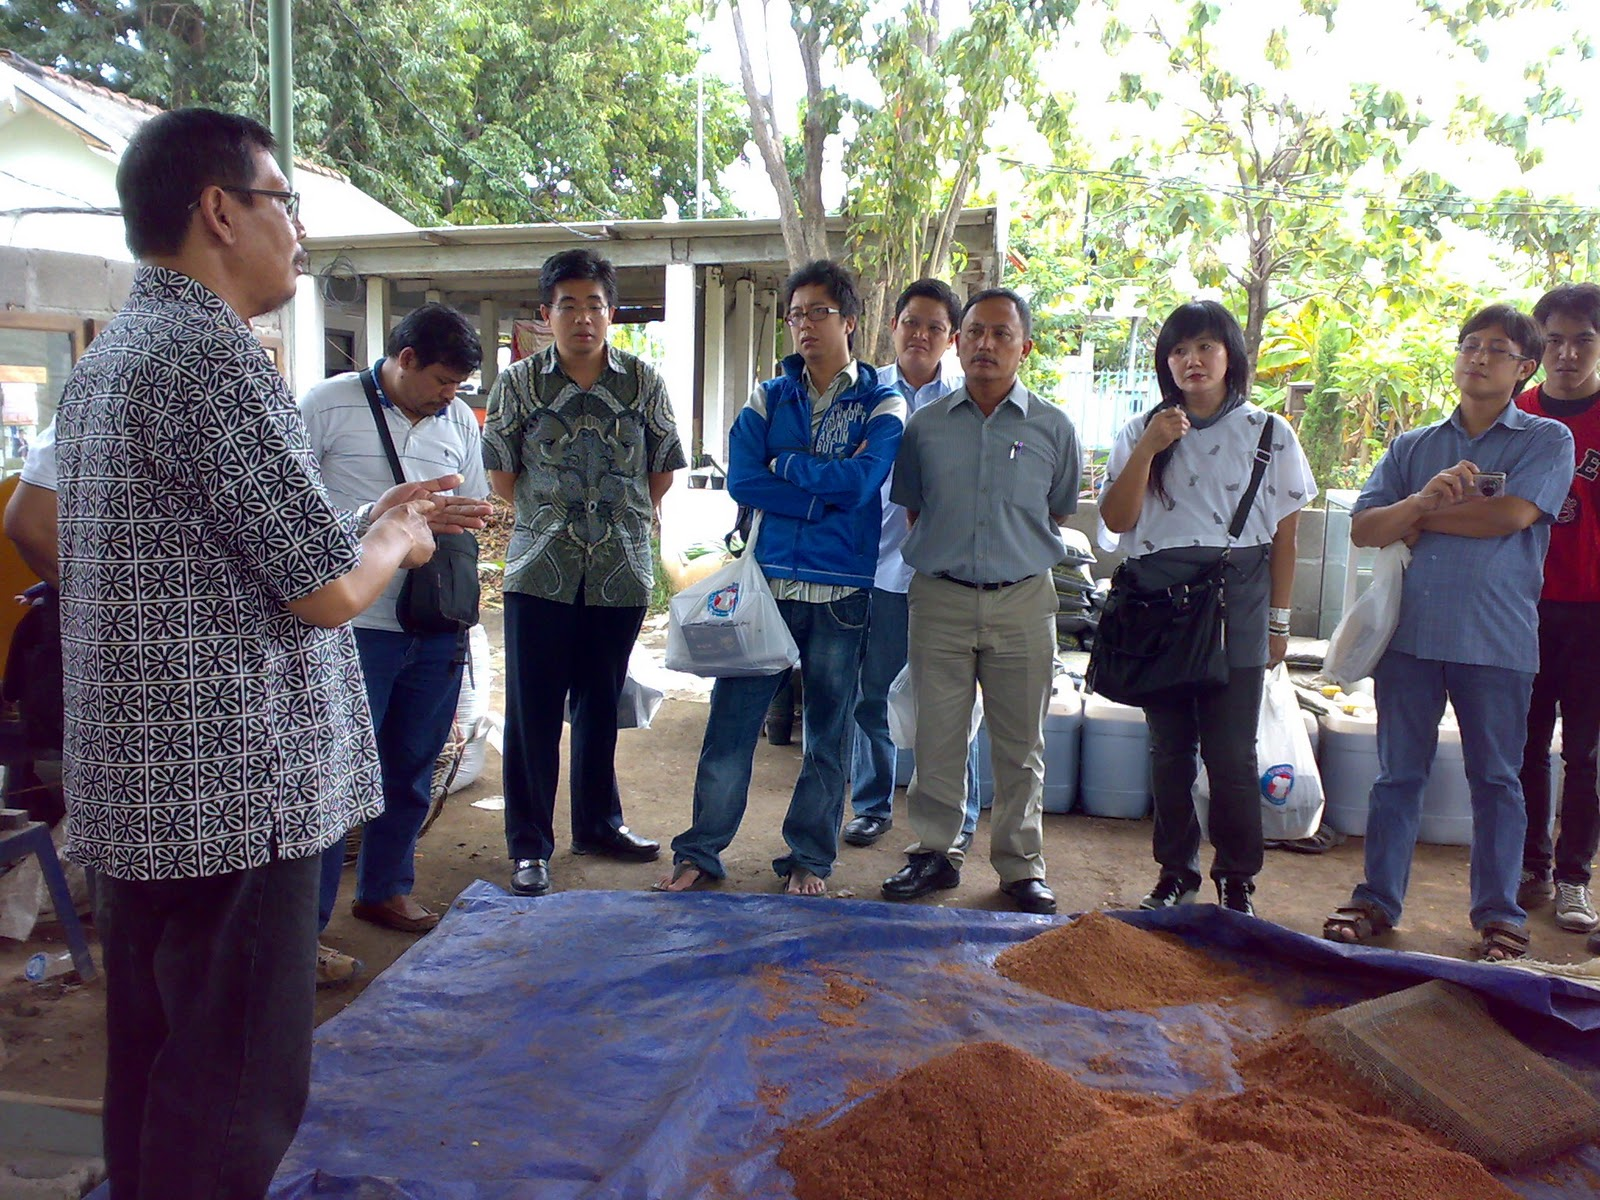 November 2010 Pelatihan Usaha Kecil Ukm Industri Rumah Tangga Produk Bumn Kripik Kripixx Jamoer Jamur Surabaya Program Go Green Memungkinkan Menengah Tumbuh Dan Berkembang Dalam Pupuk Skala Karena Pemerintah Tahun Ini